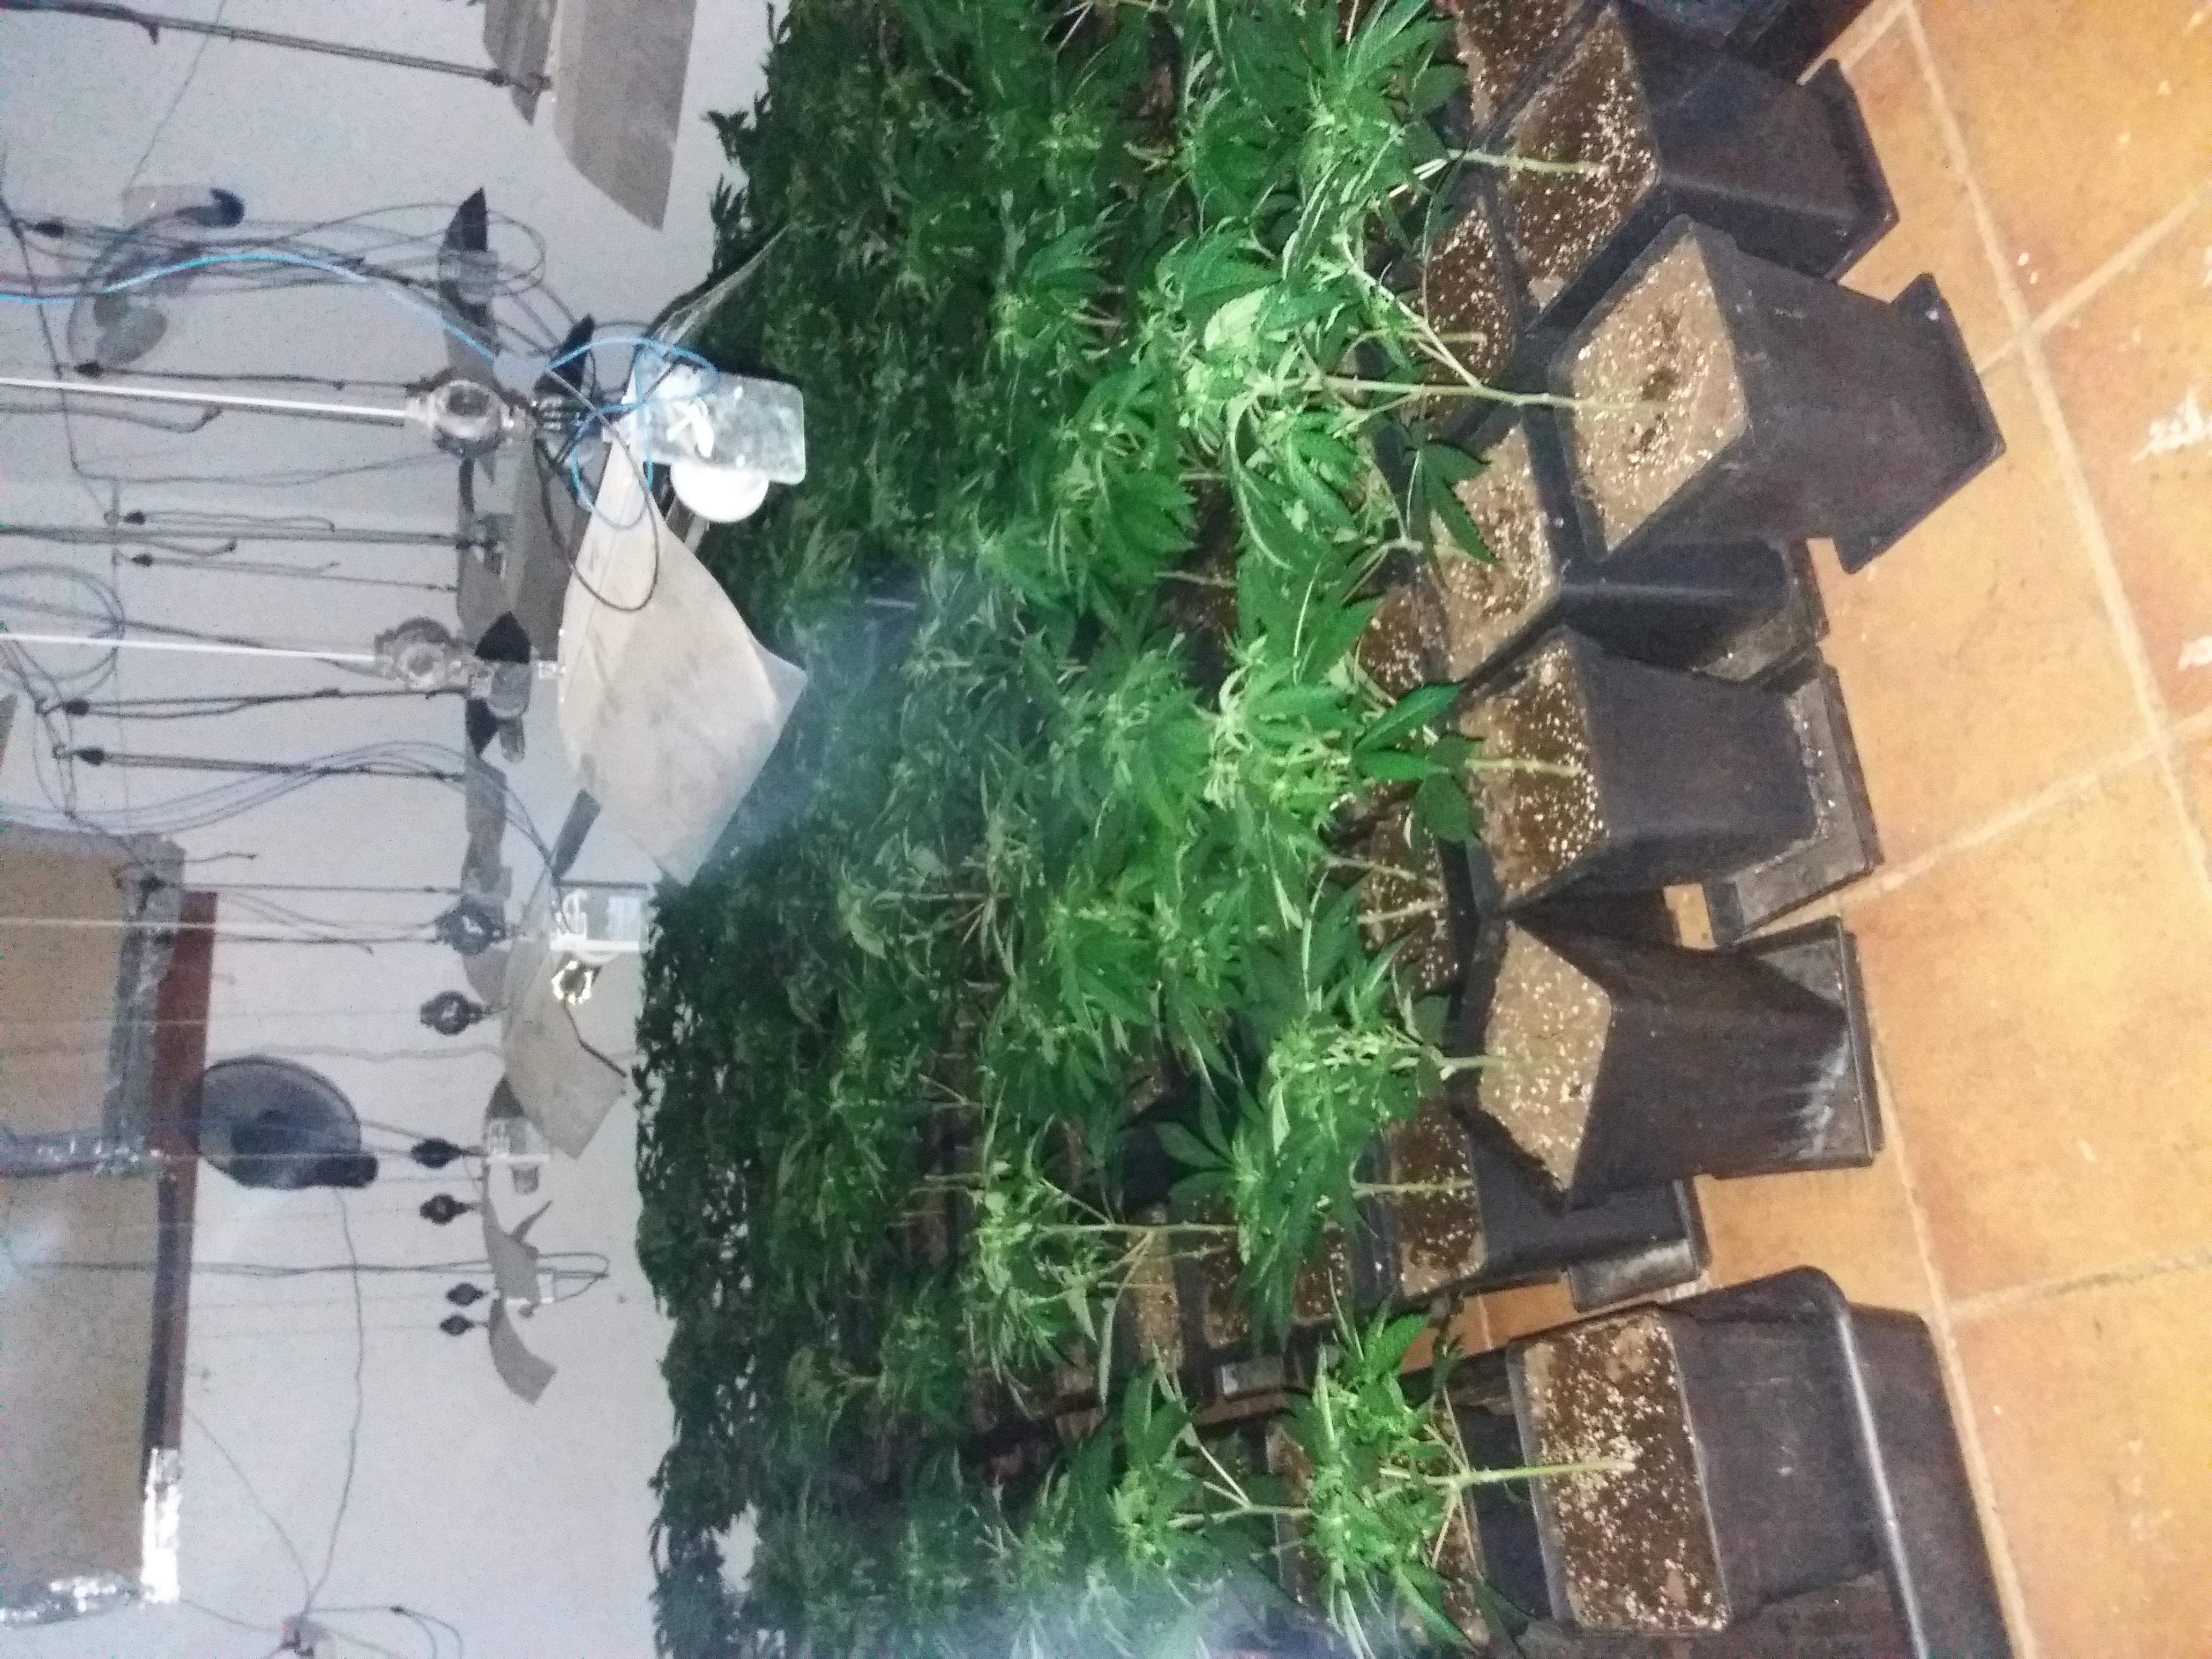 Como hacer cogollos de marihuana gigantes - Guía de cultivo de marihuana